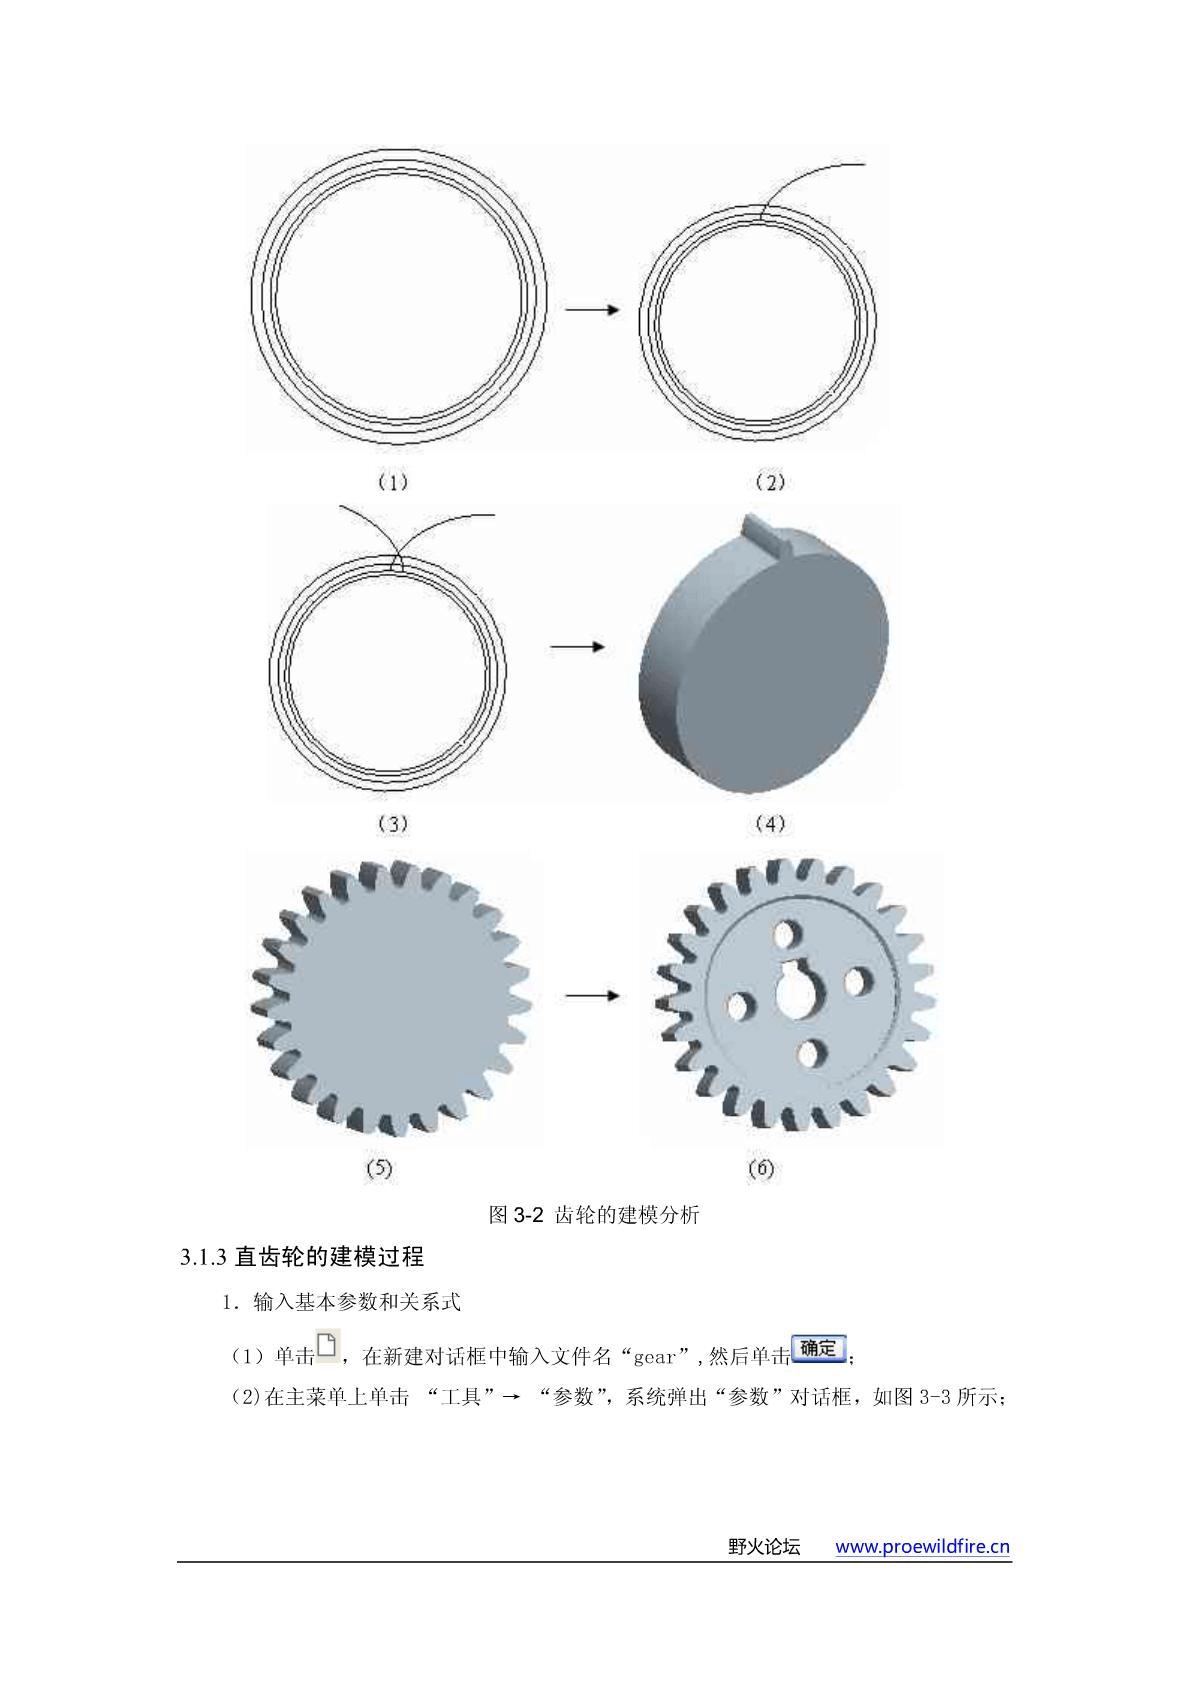 proe齿轮画法图片